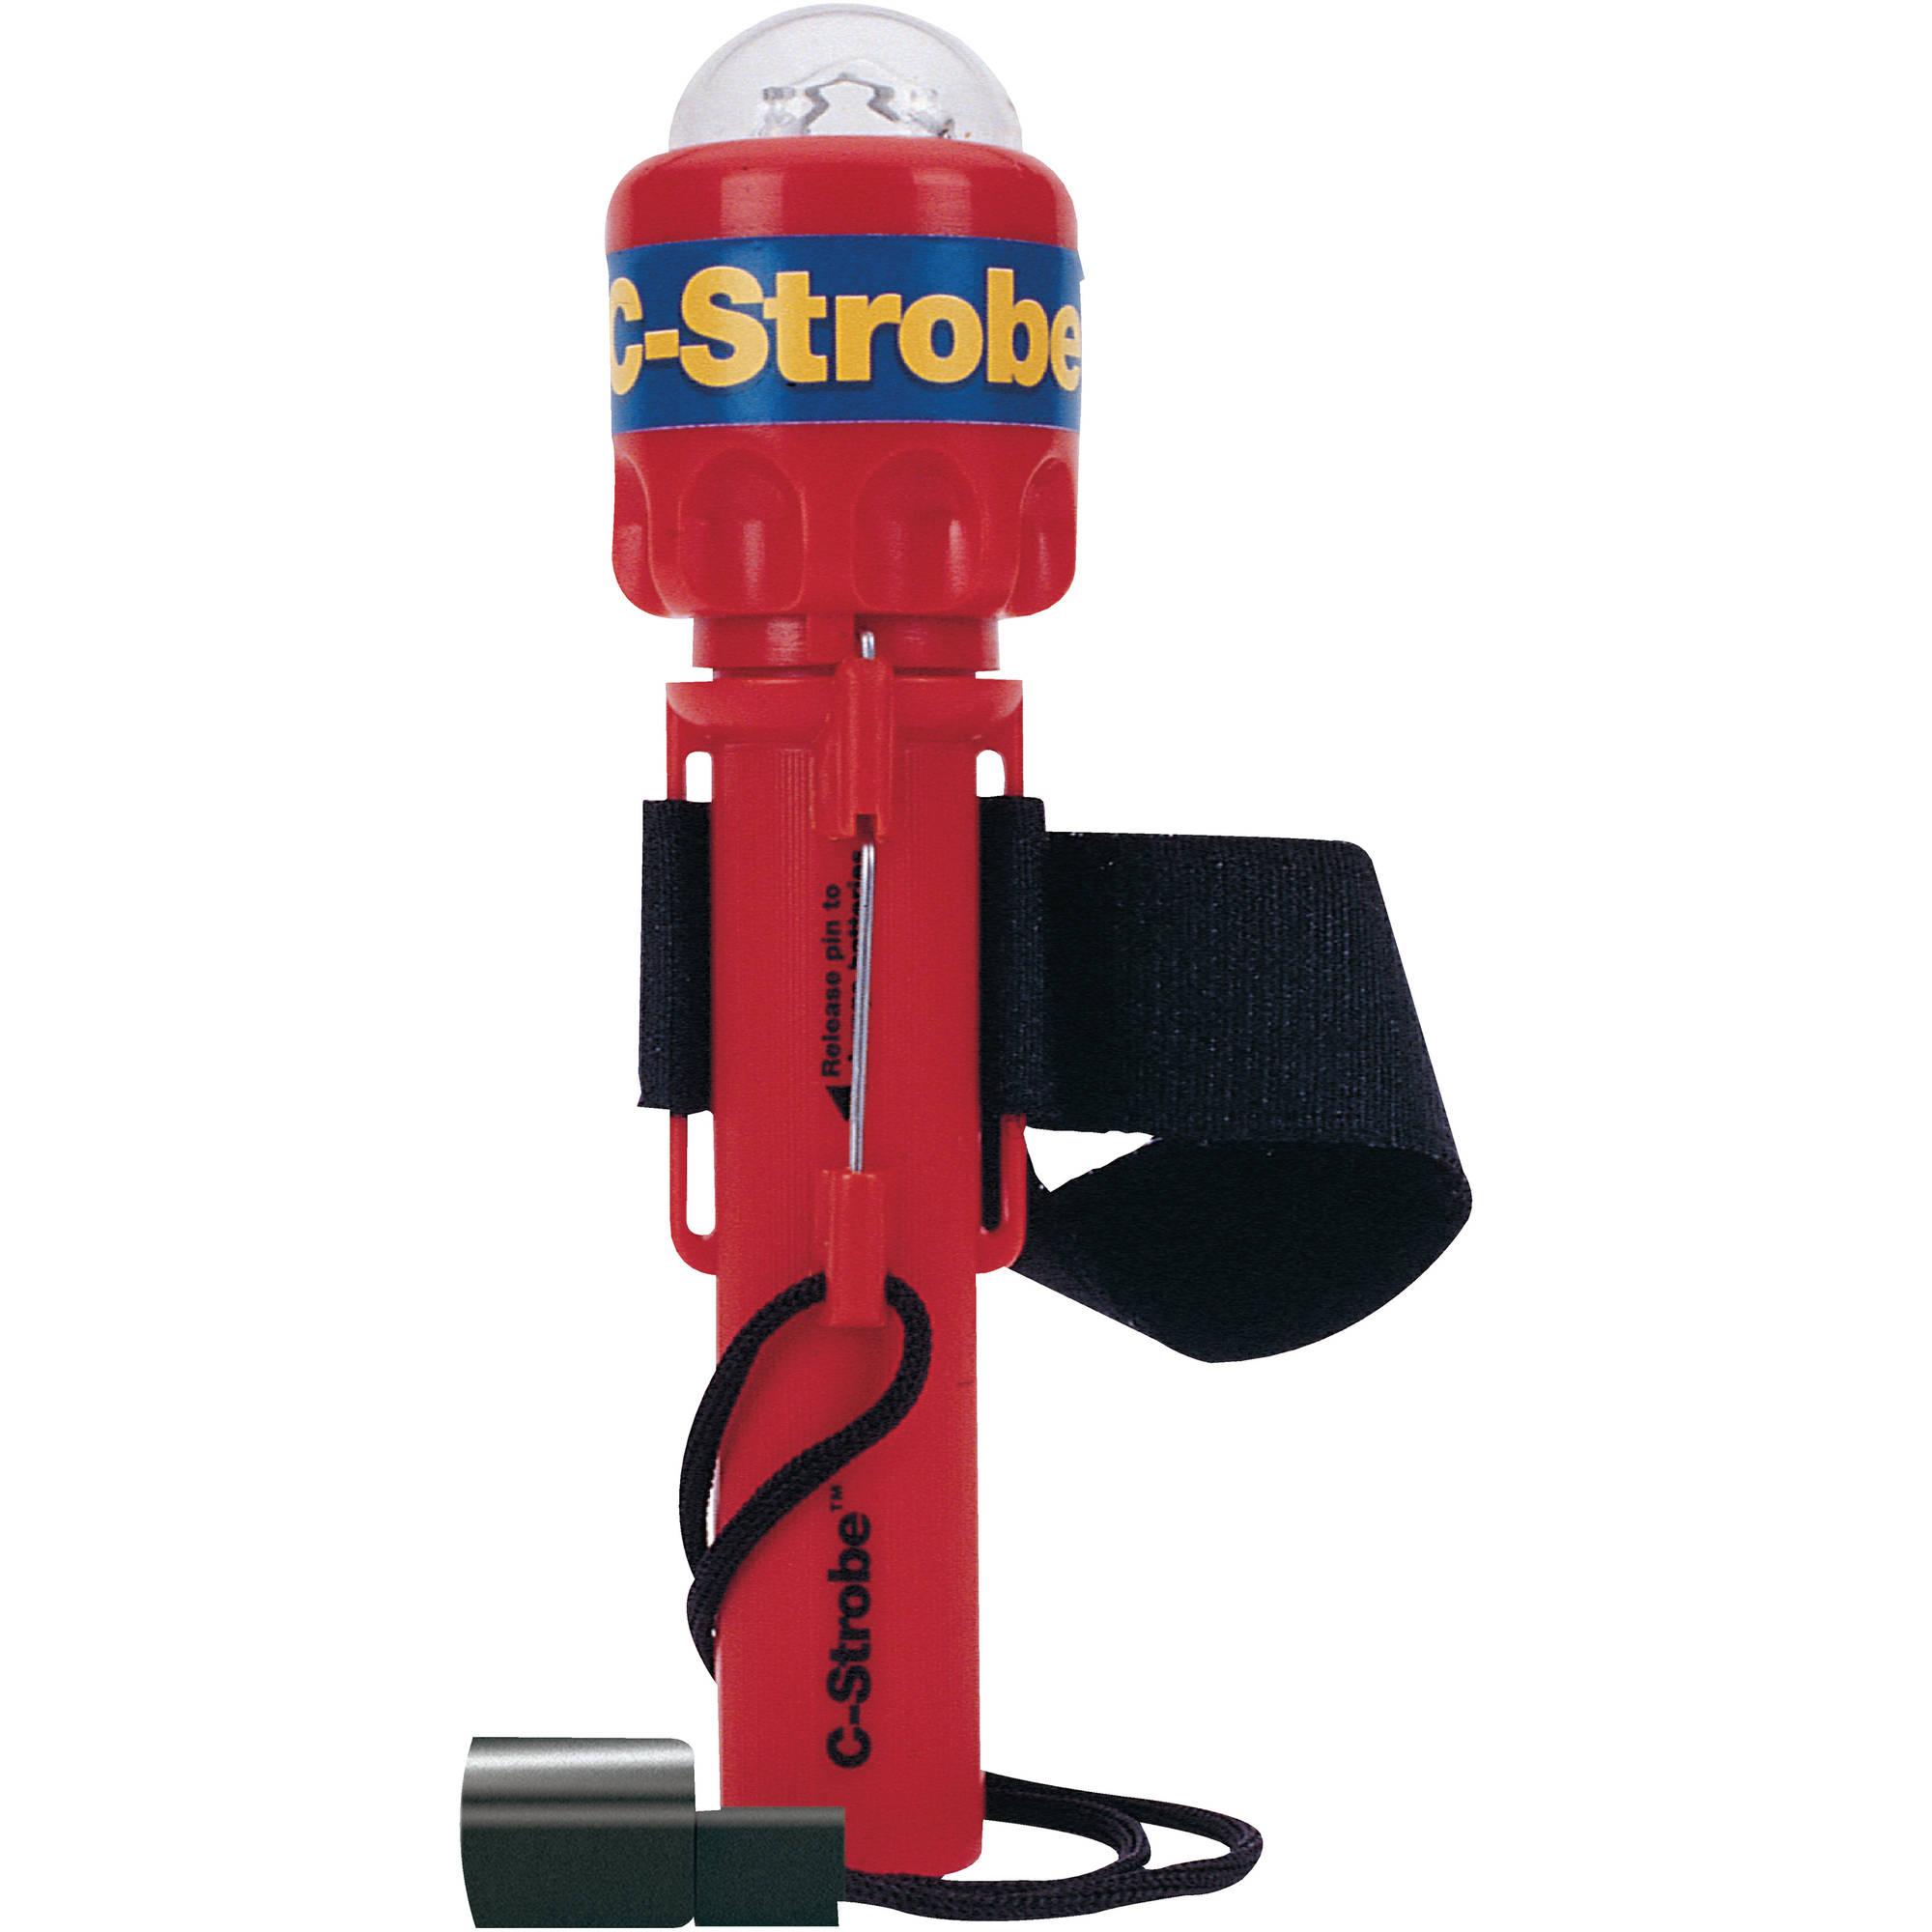 ACR Electronics 3959 C-Strobe Life Jacket Emergency Signal with C-Clip